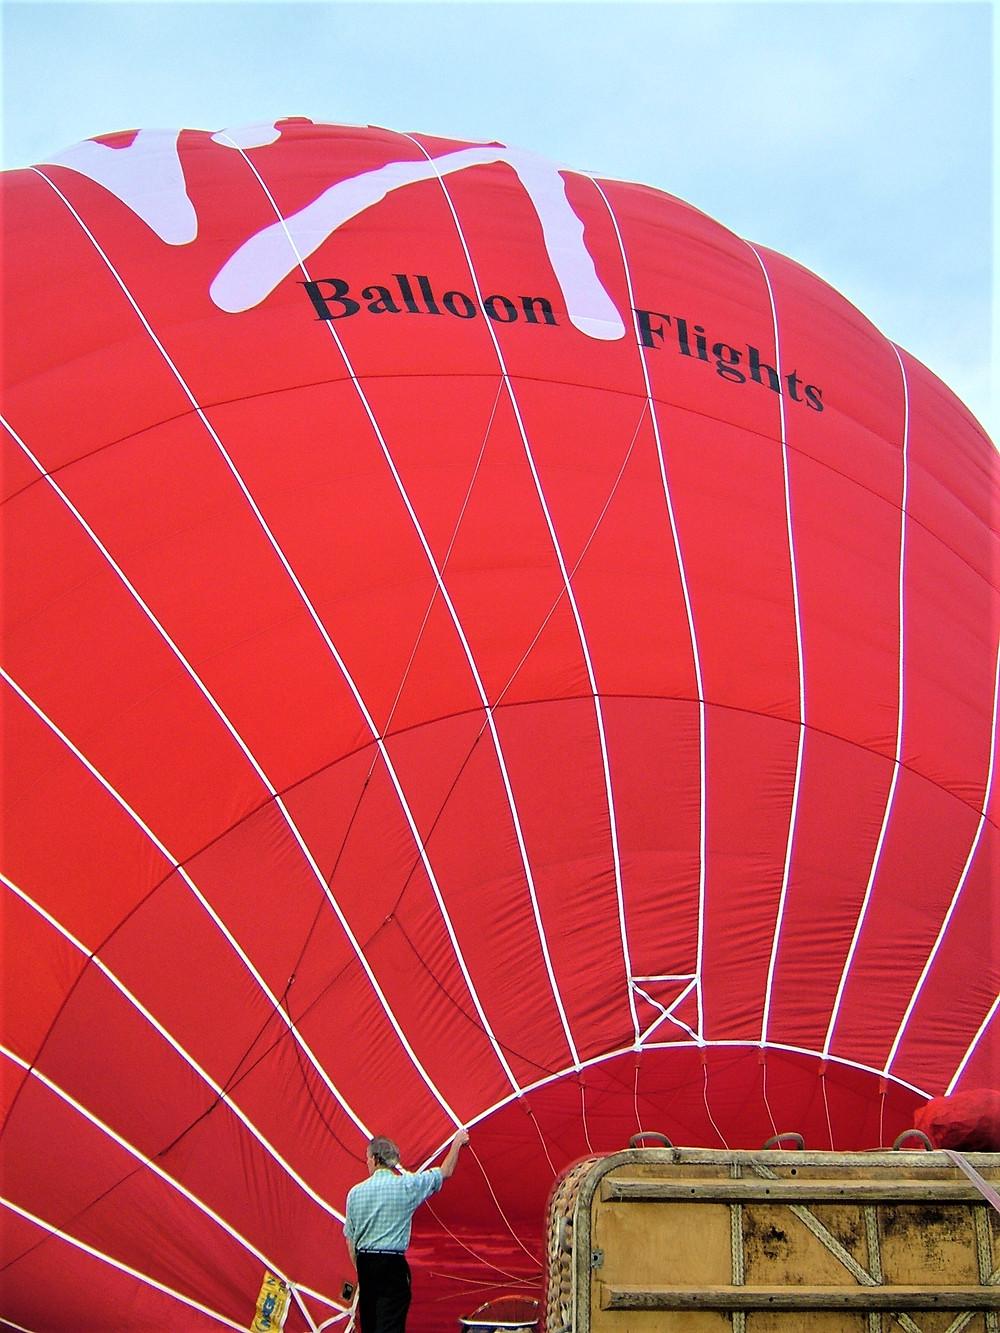 Red Virgin Hot Air Balloon